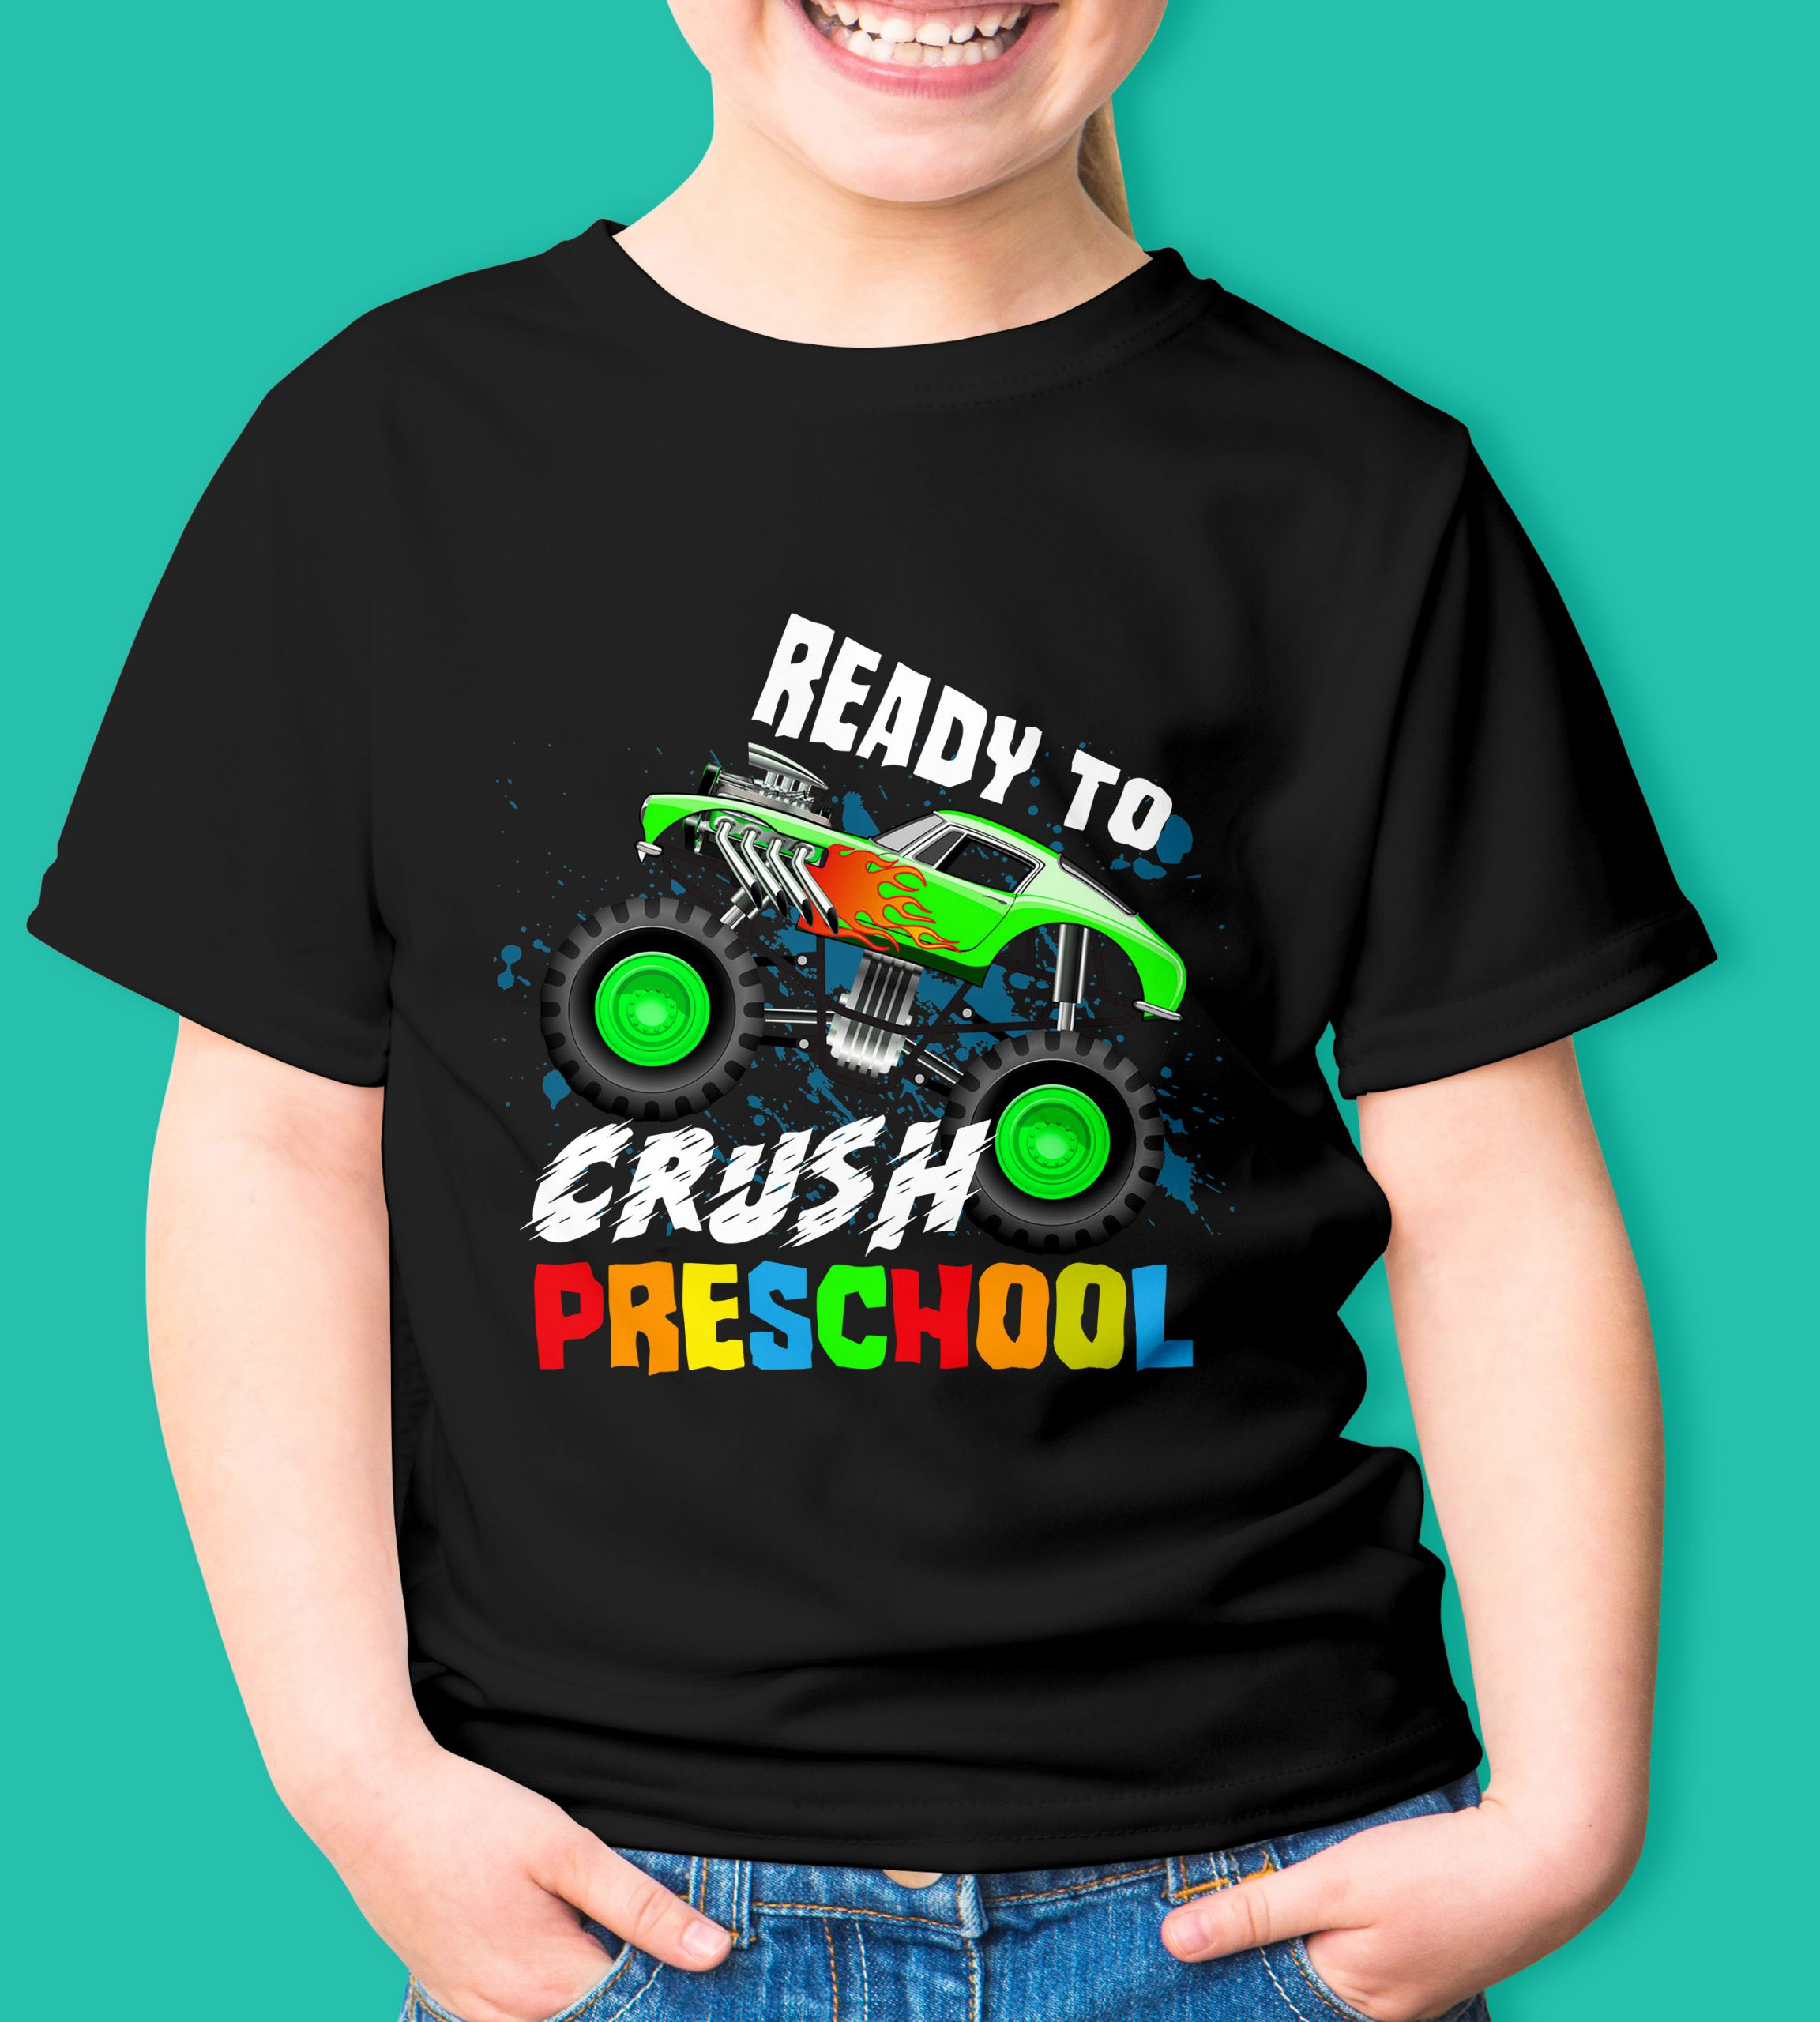 Ready to crush preschool